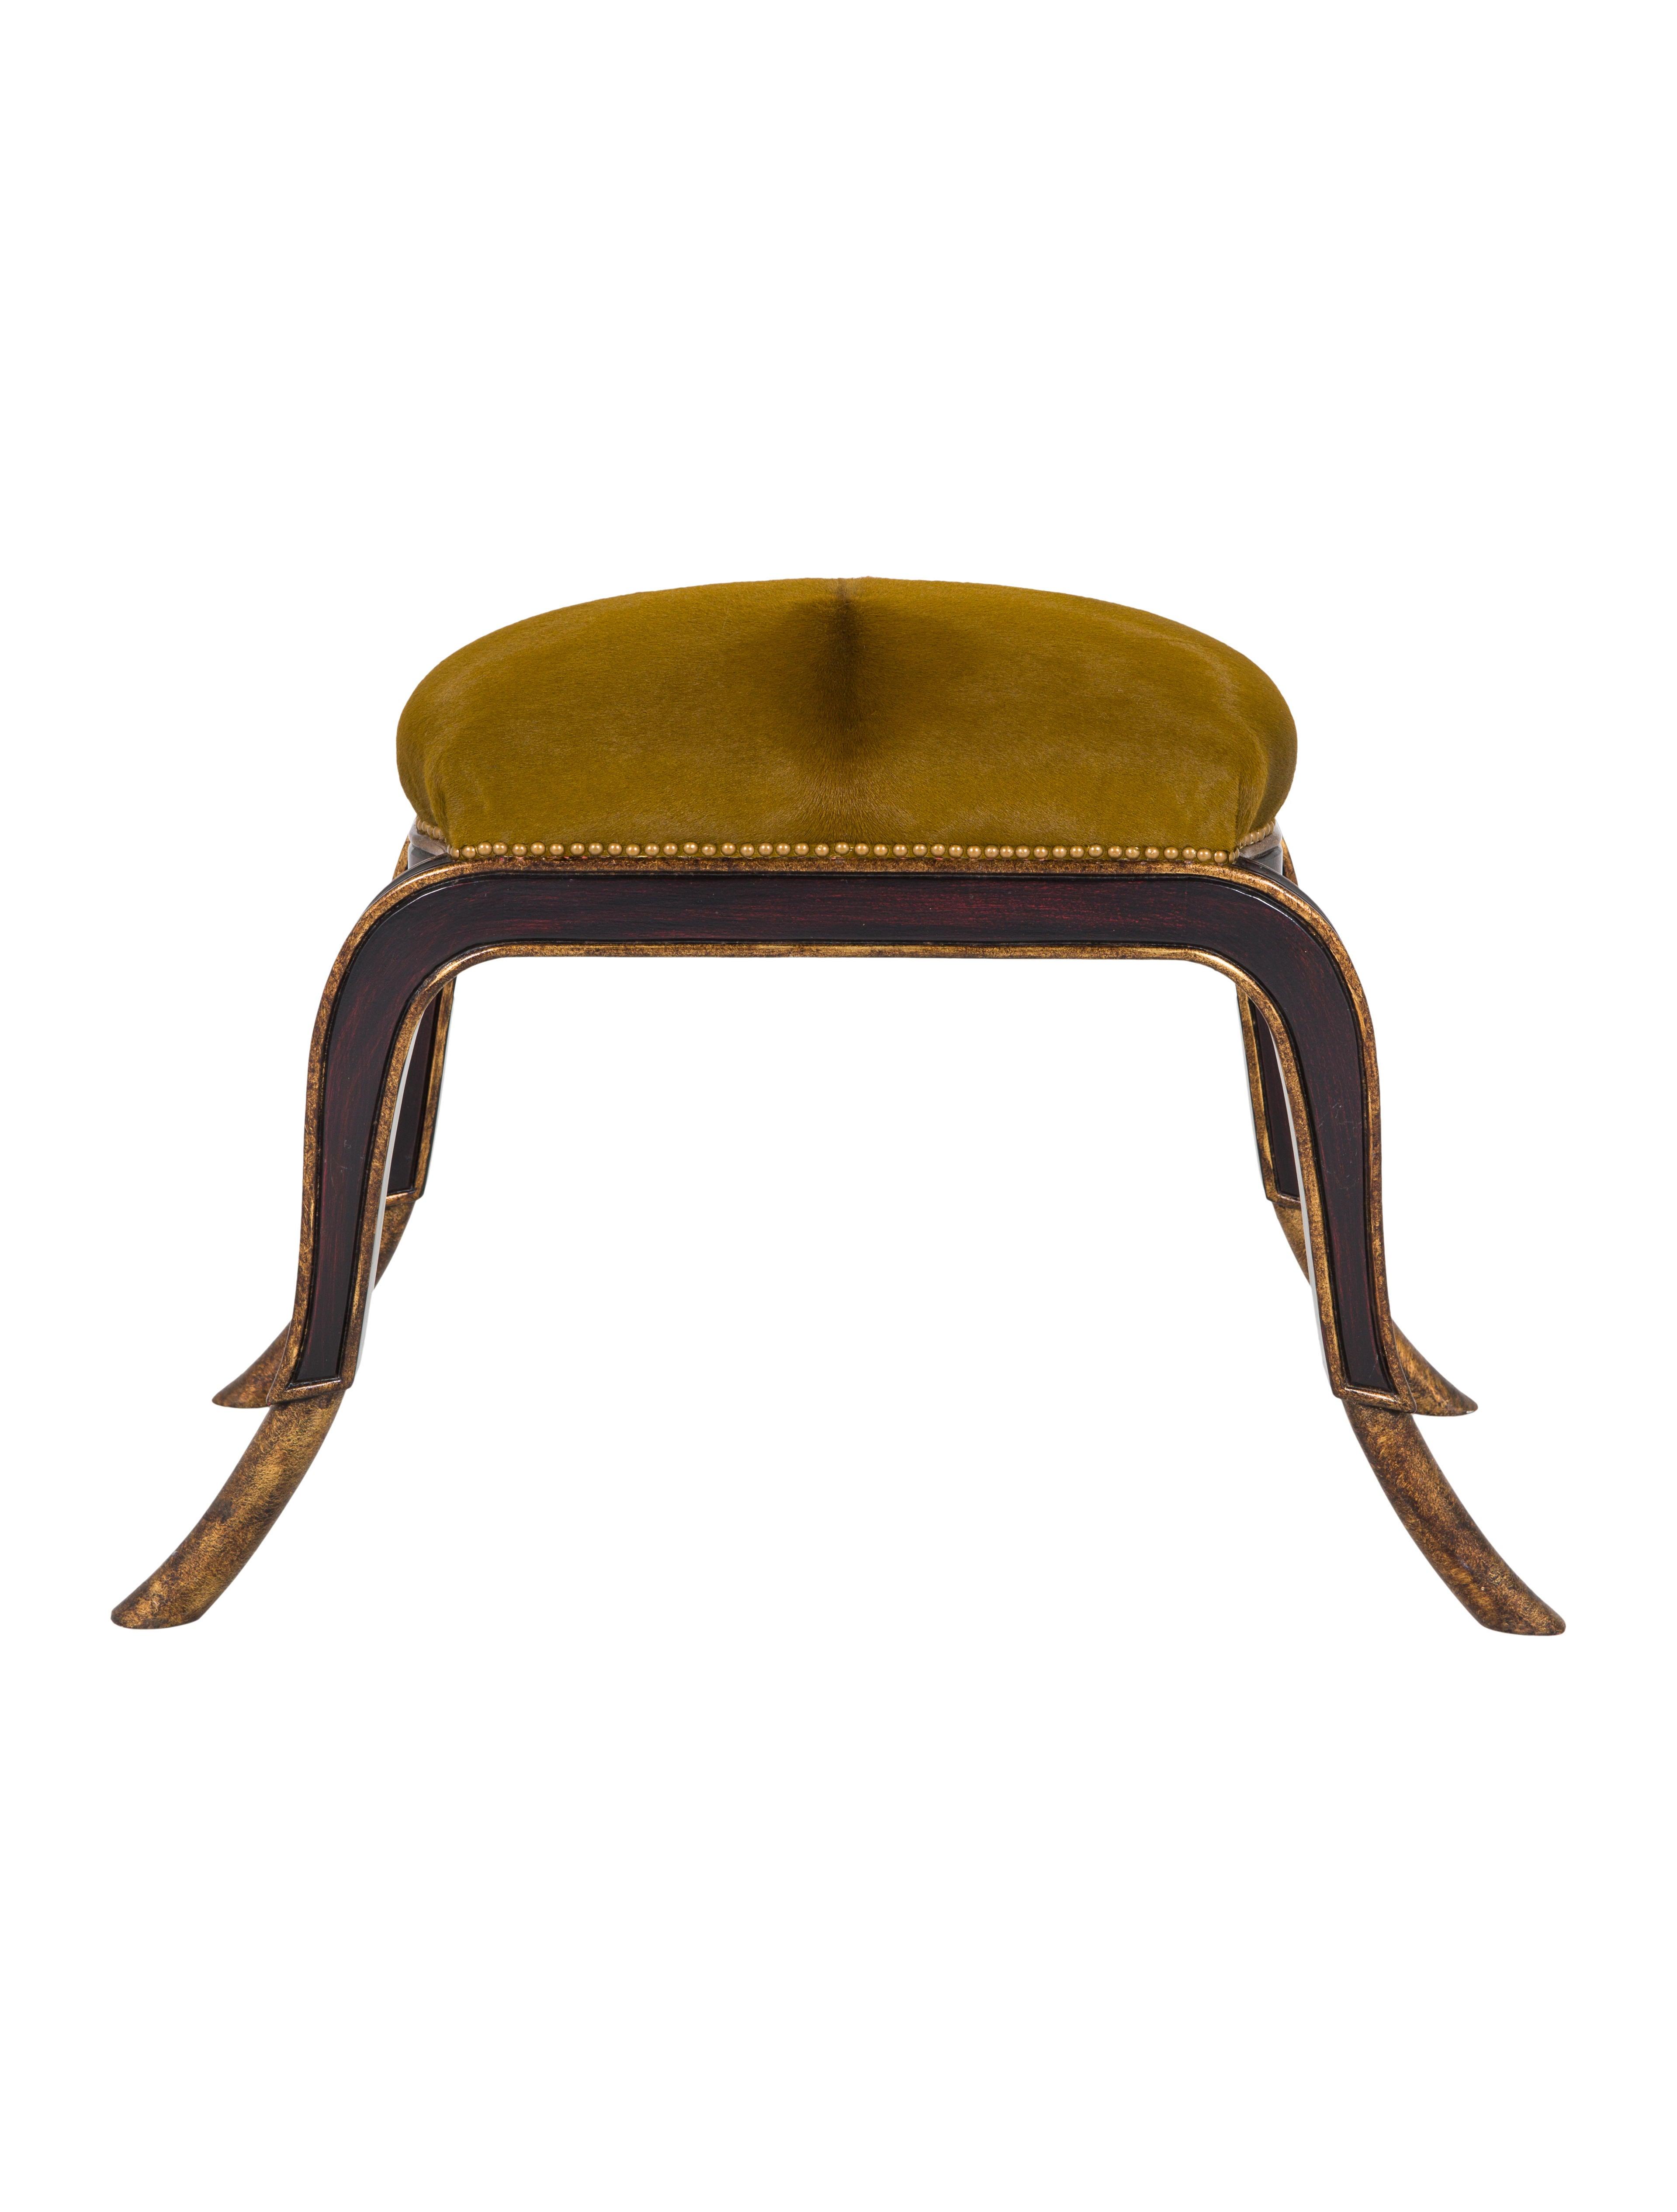 Cowhide Stool Furniture Furni20104 The Realreal